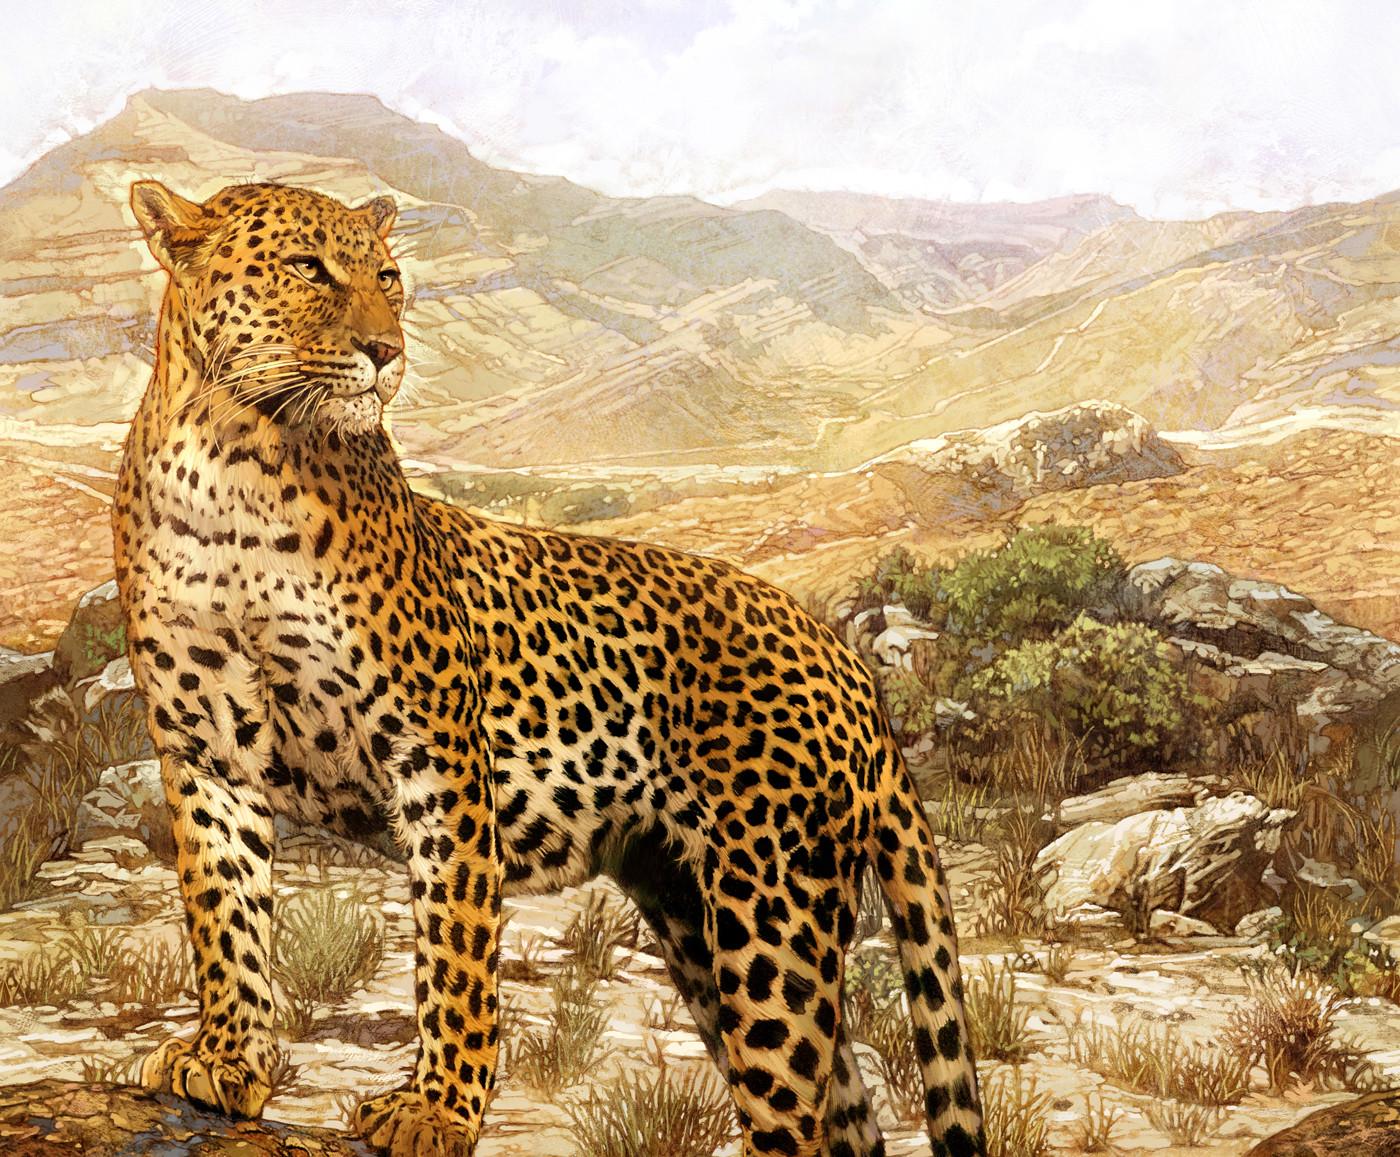 Kinsun loh leopard03